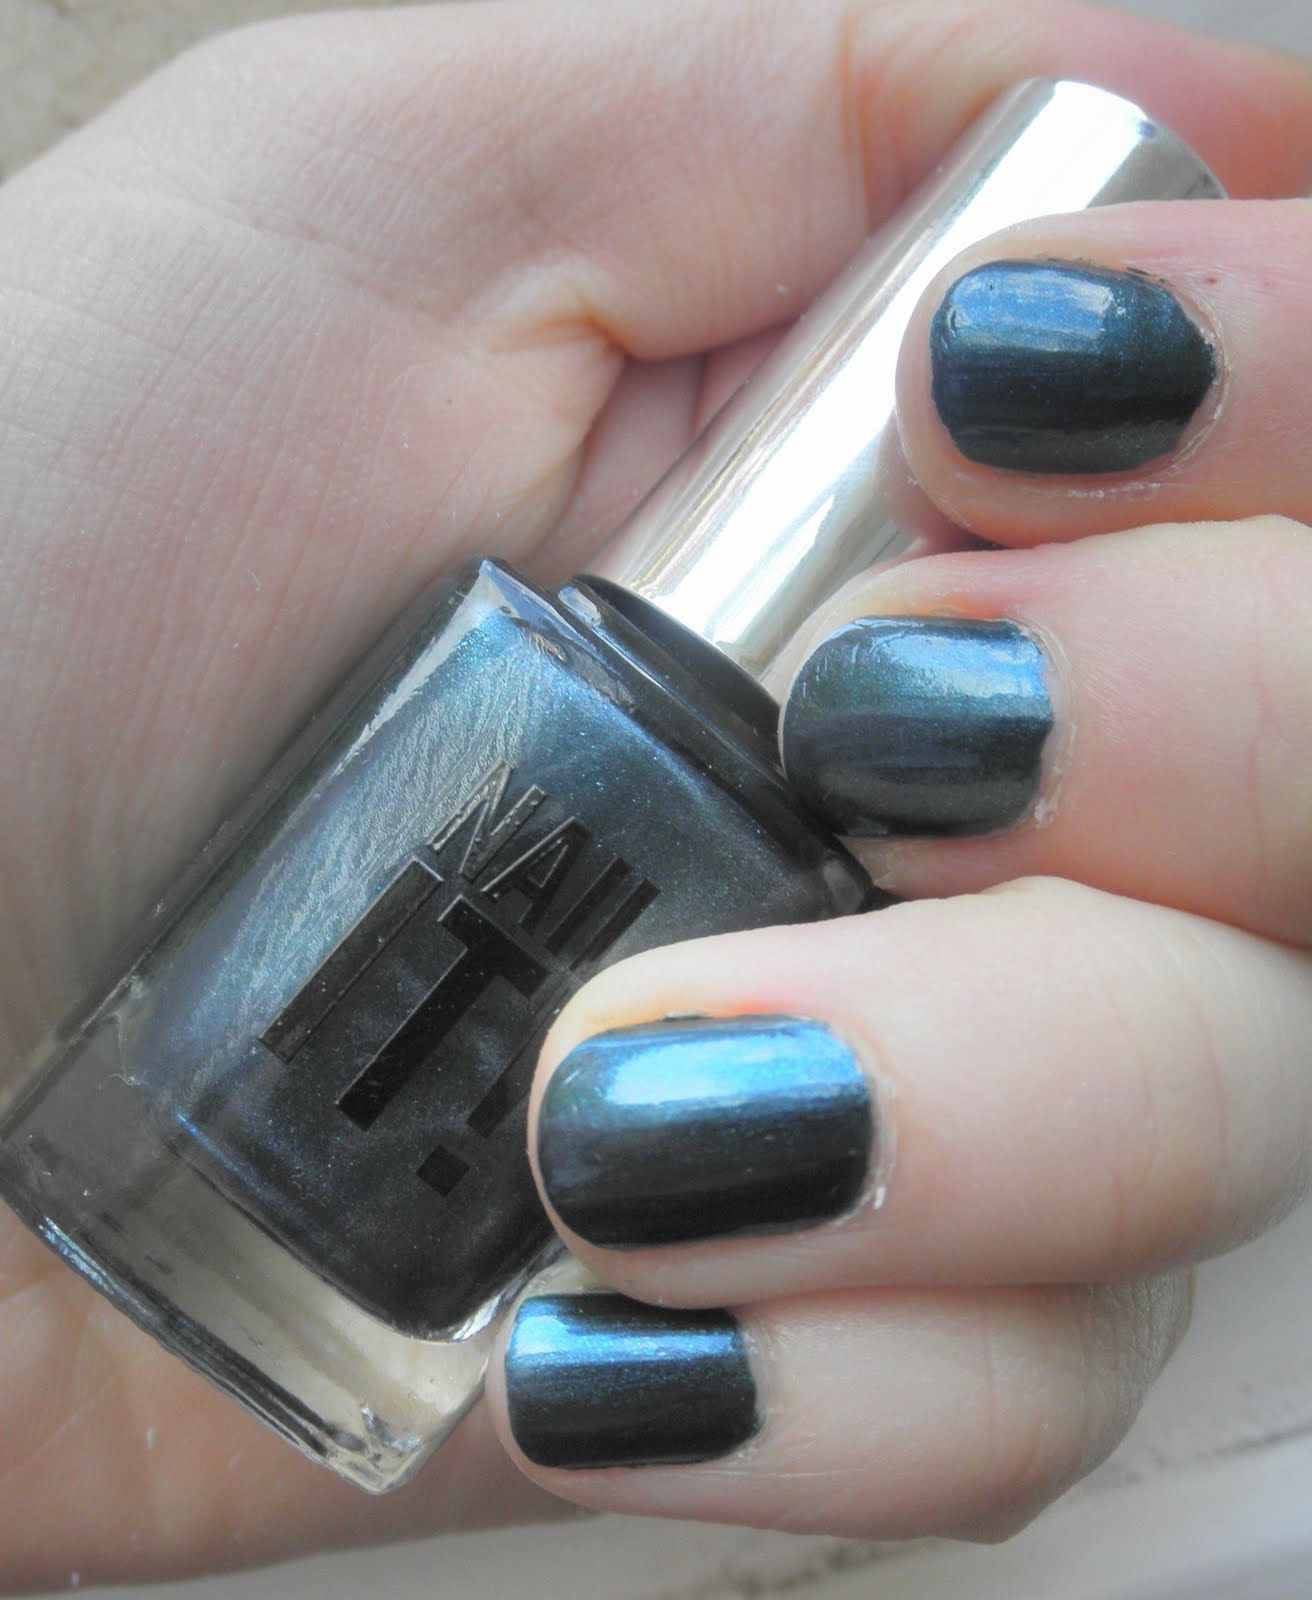 miss chew: Fake Chanel Black Pearl Nail Polish? Sign me up...